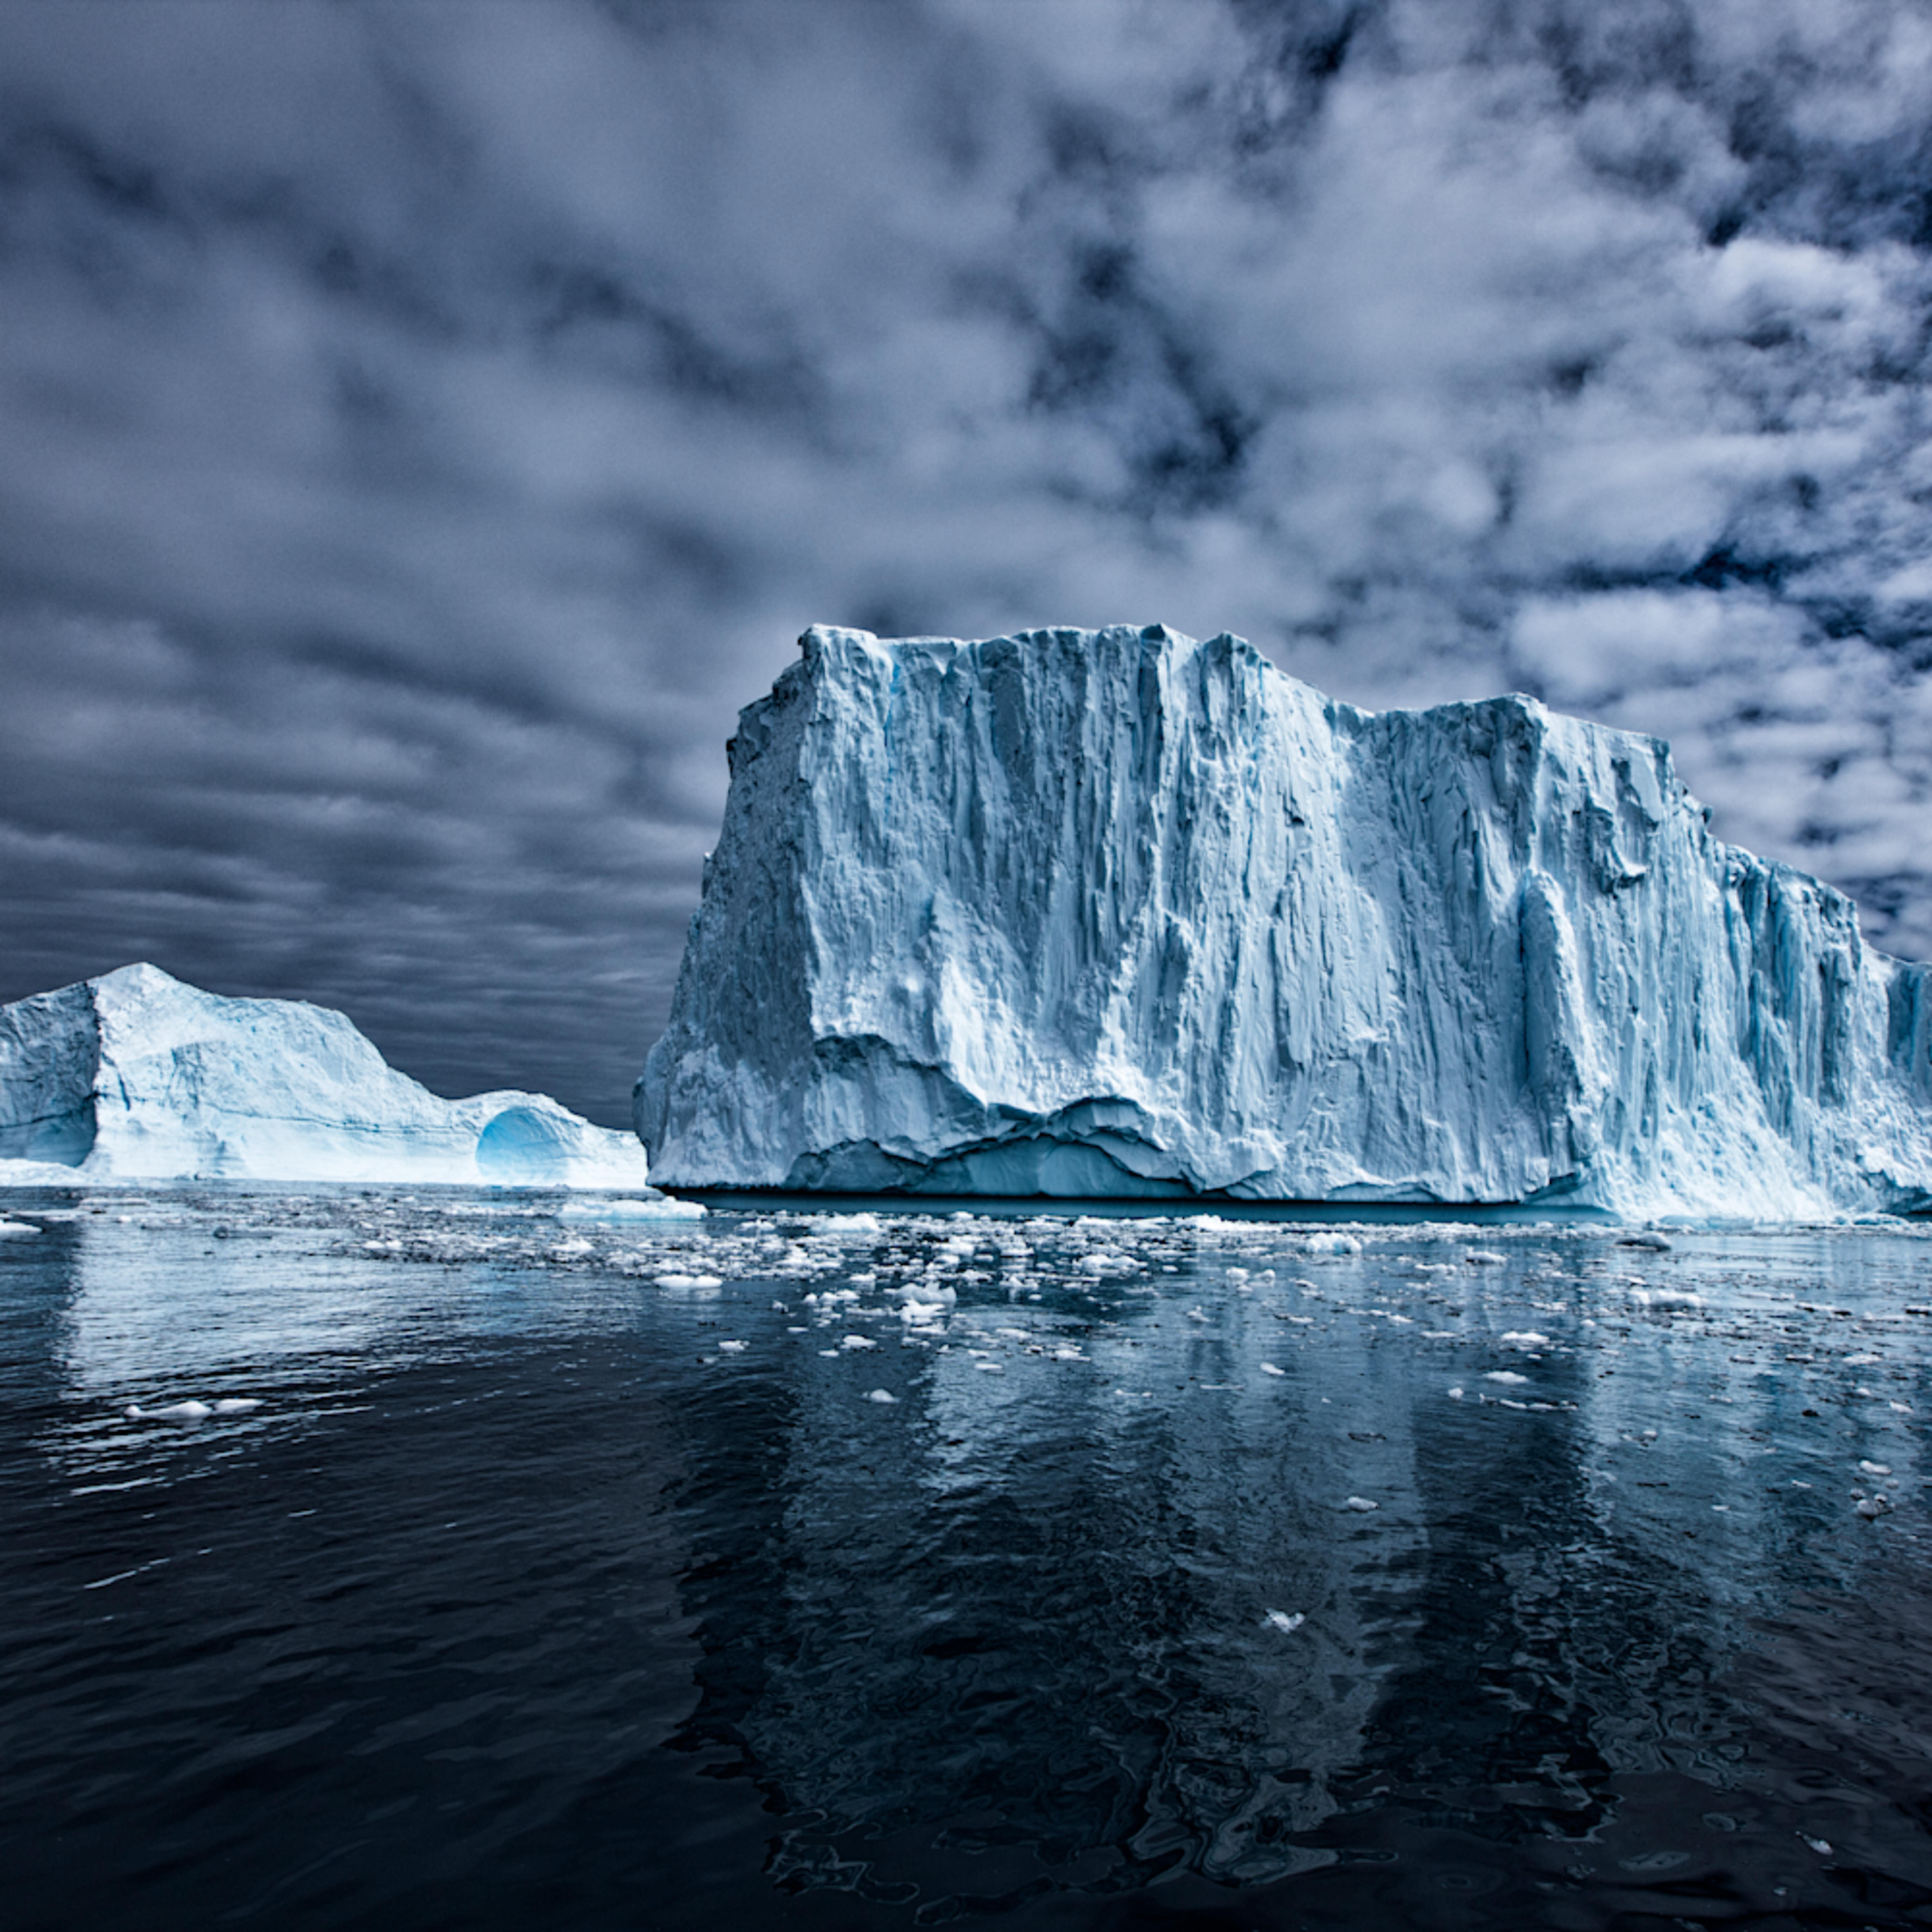 Mbp antarctica 20121212 7641 m07o5o